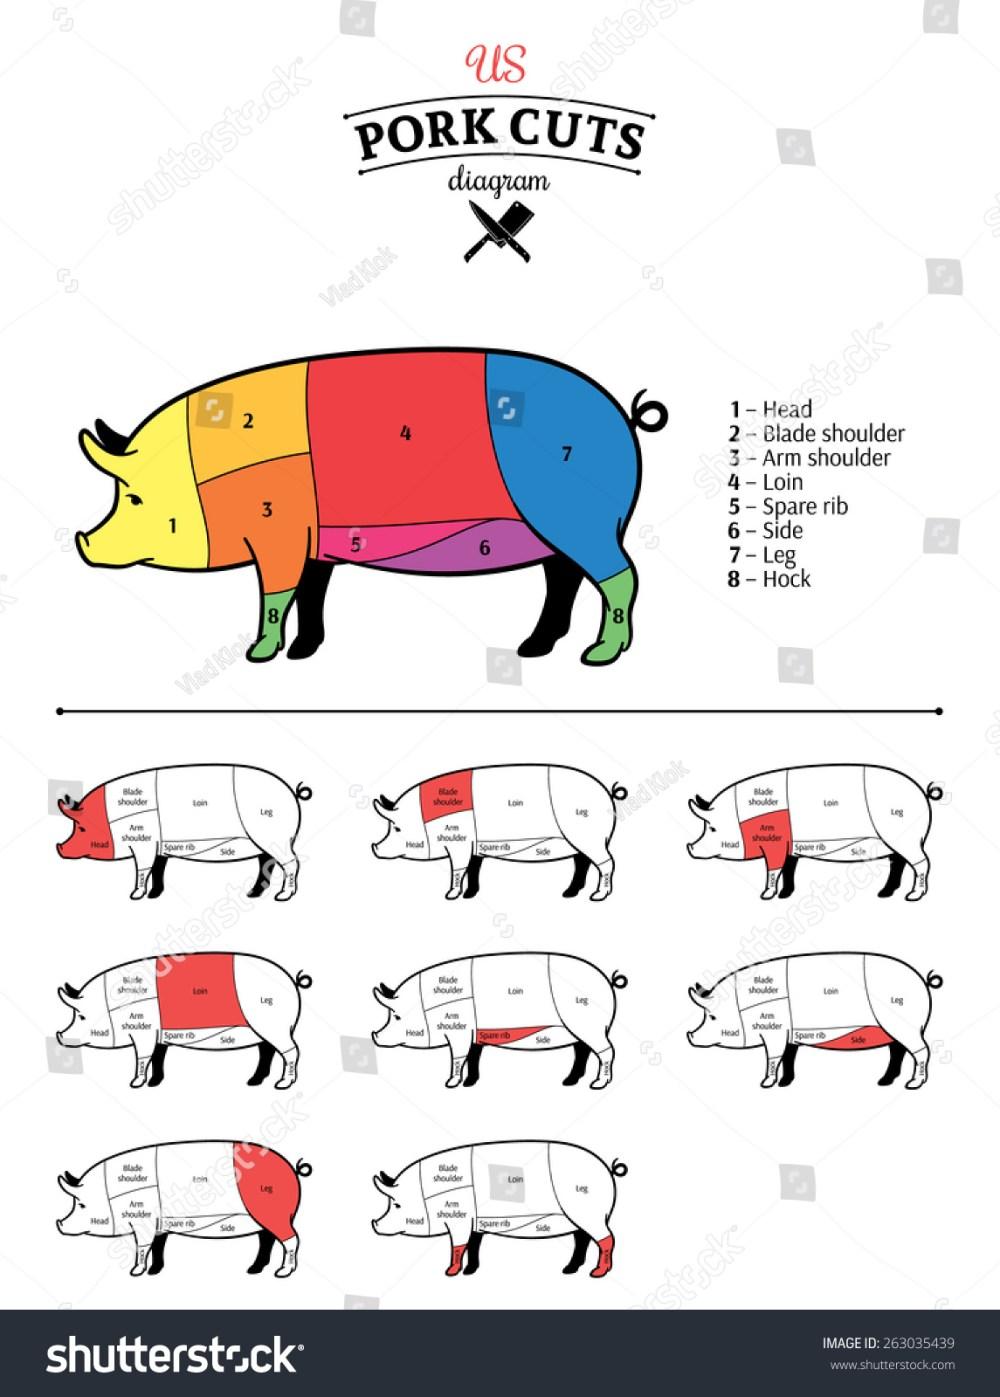 medium resolution of american us pork cuts diagram